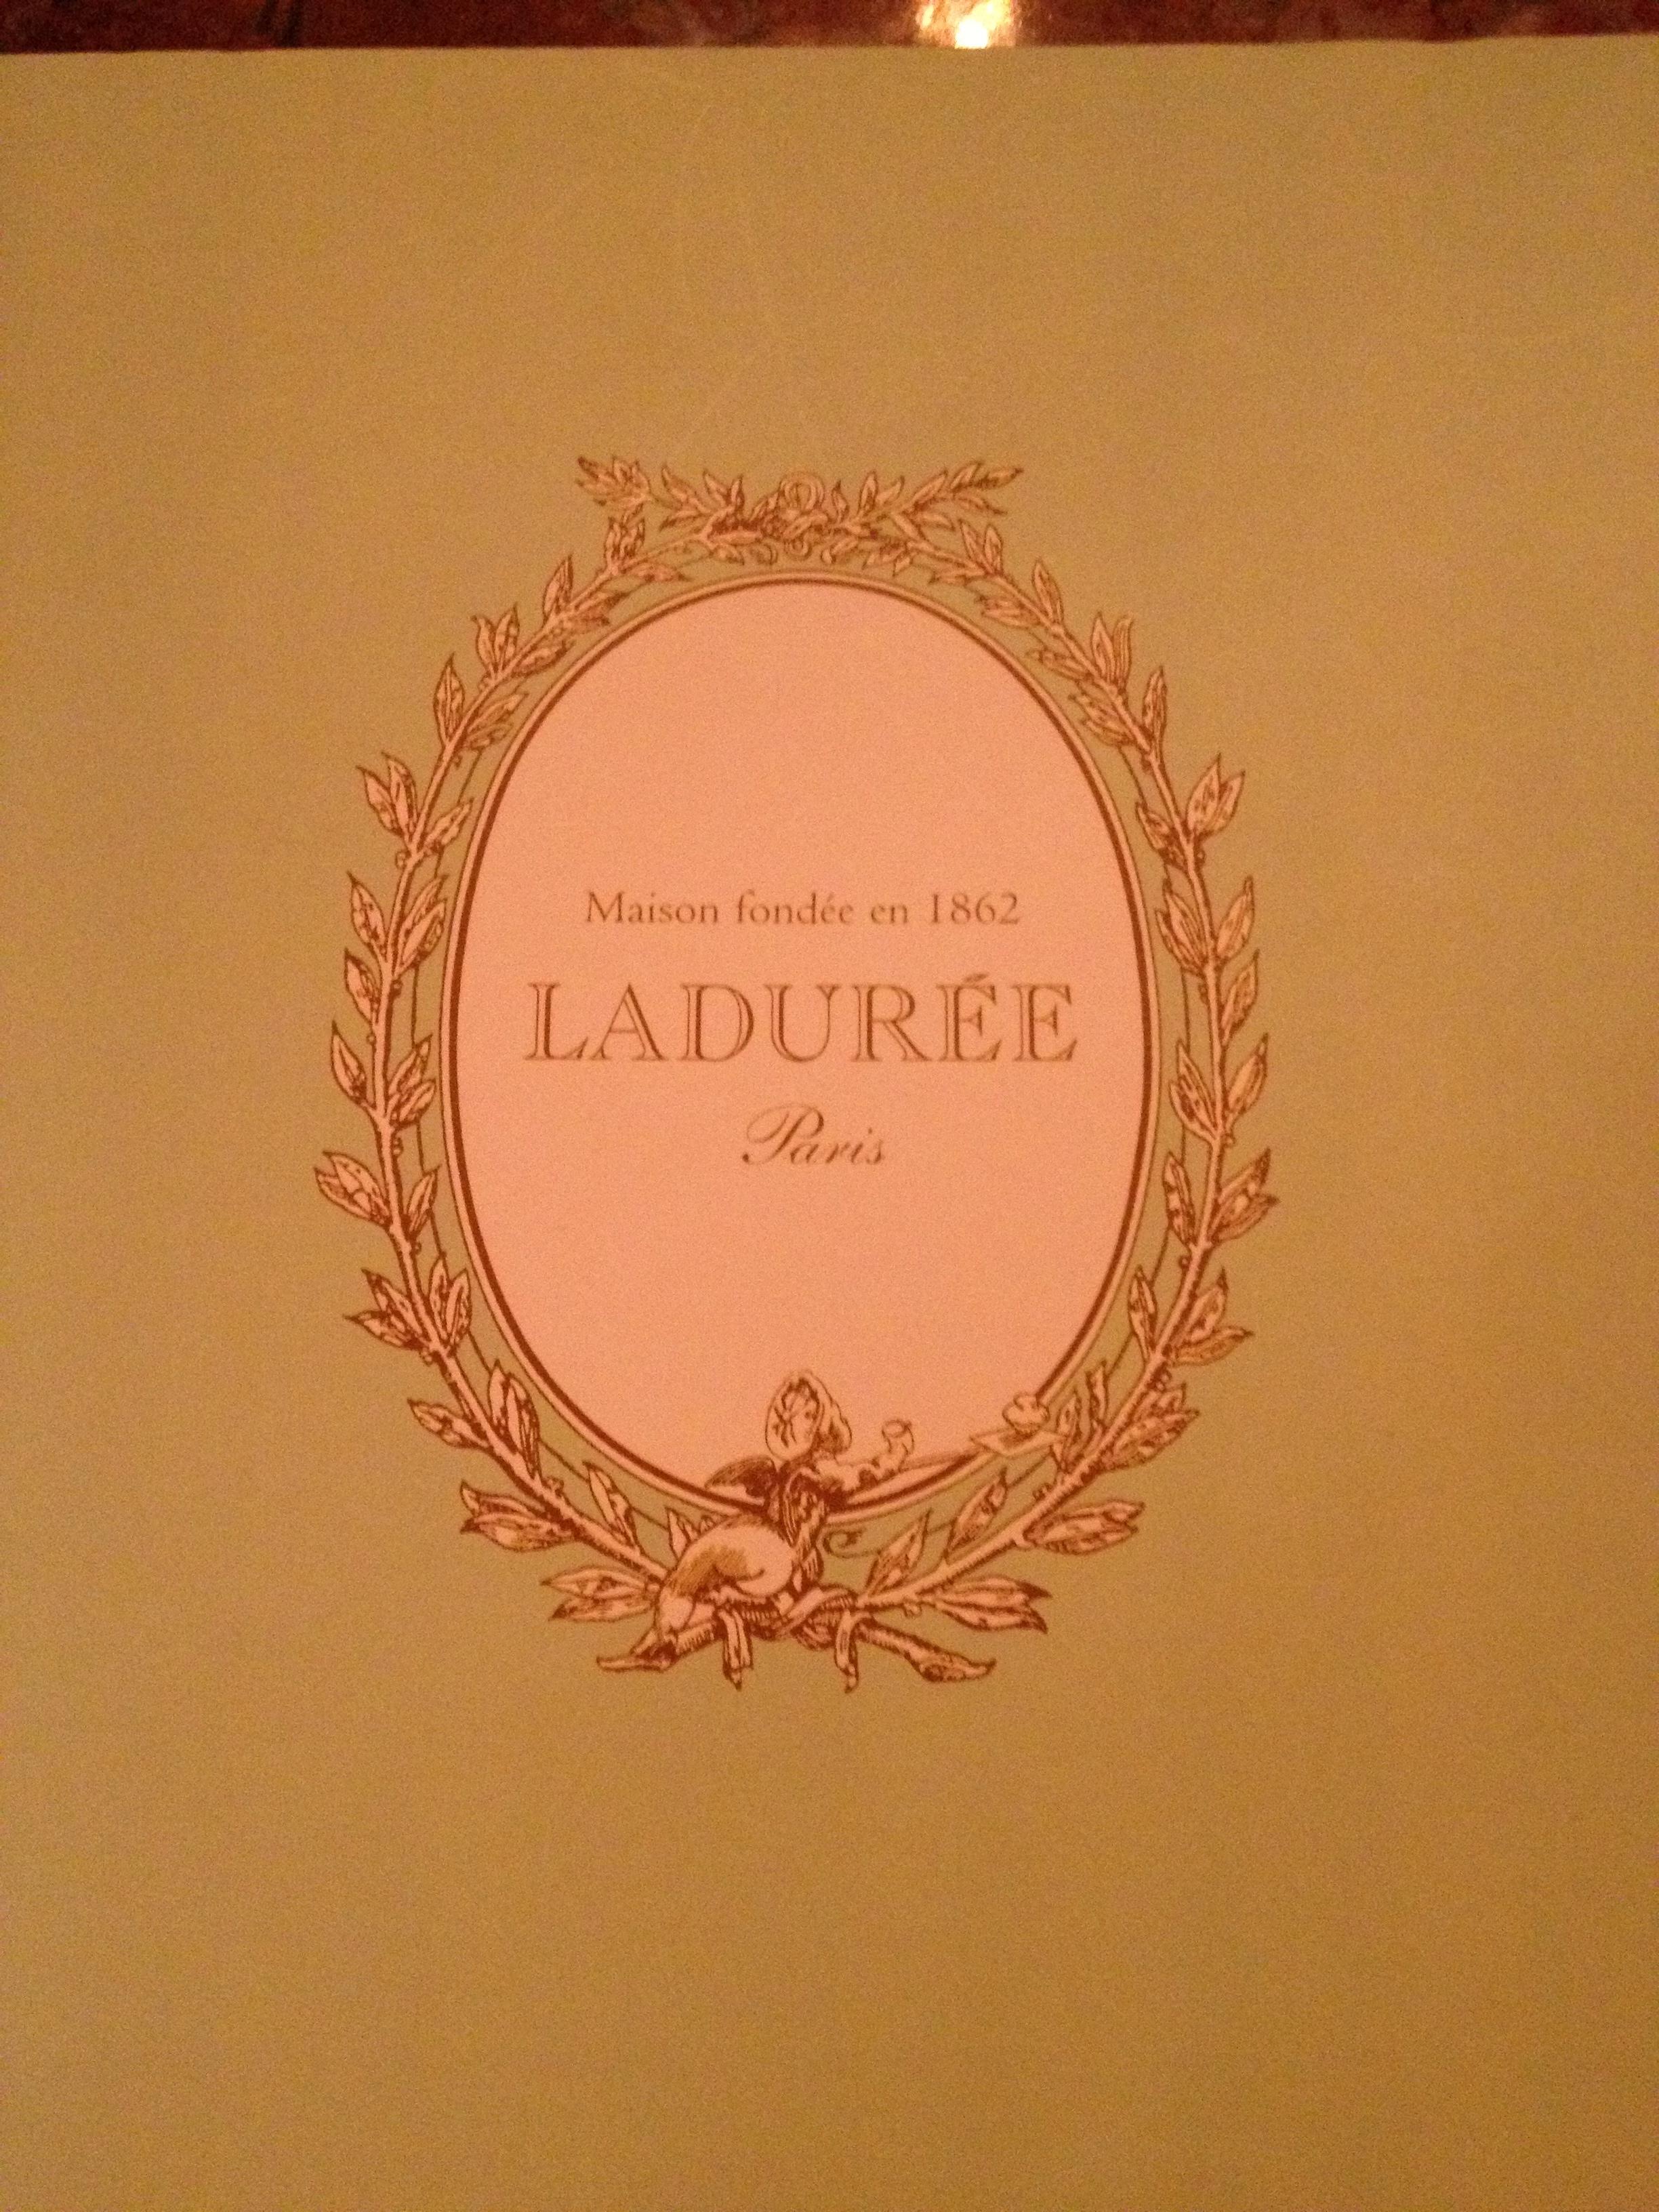 Ladurée,french macaroons